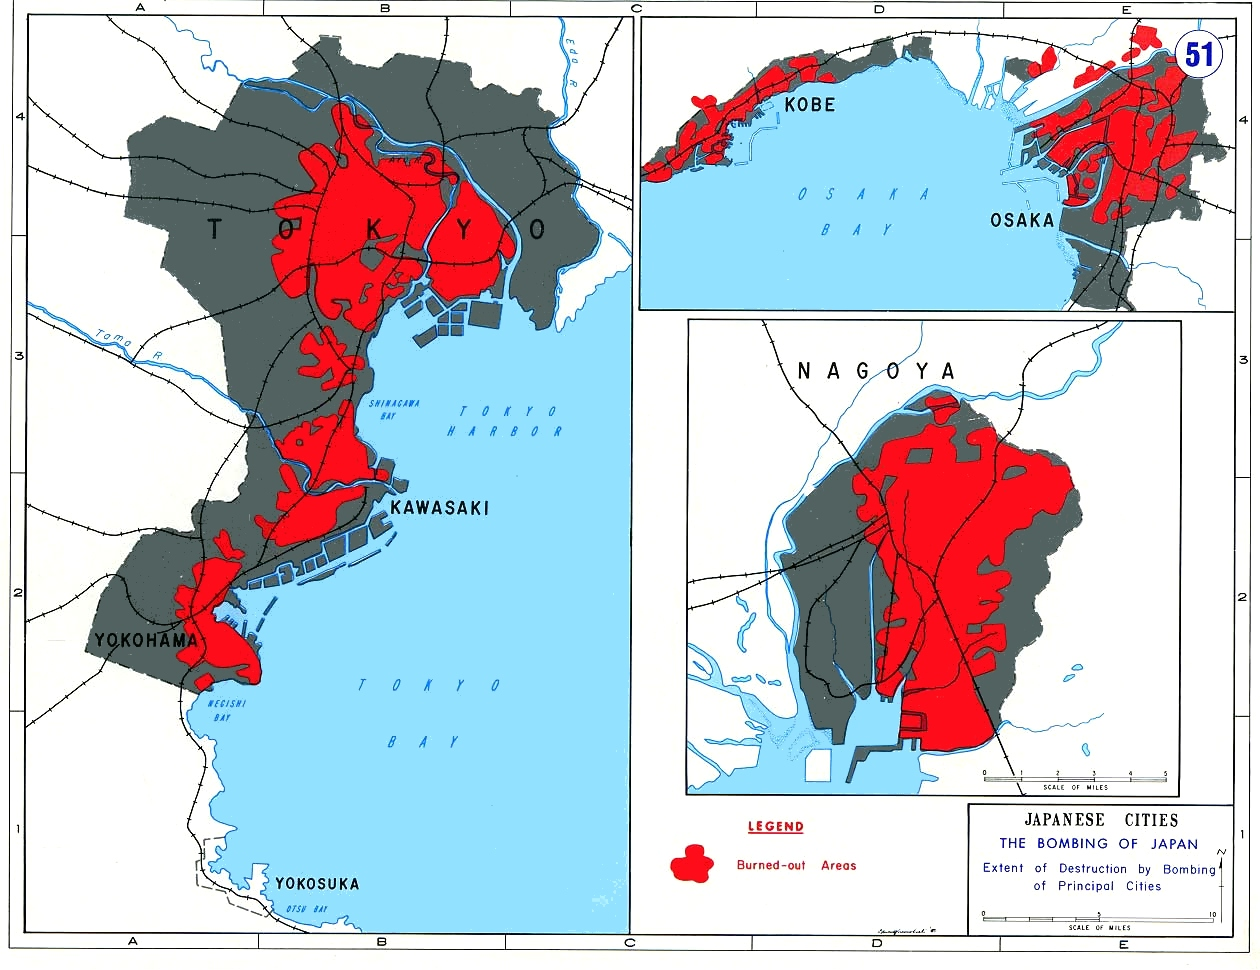 FileAreas Of Principal Japanese Cities Destoyed By US Bombingjpg - Japan map main cities